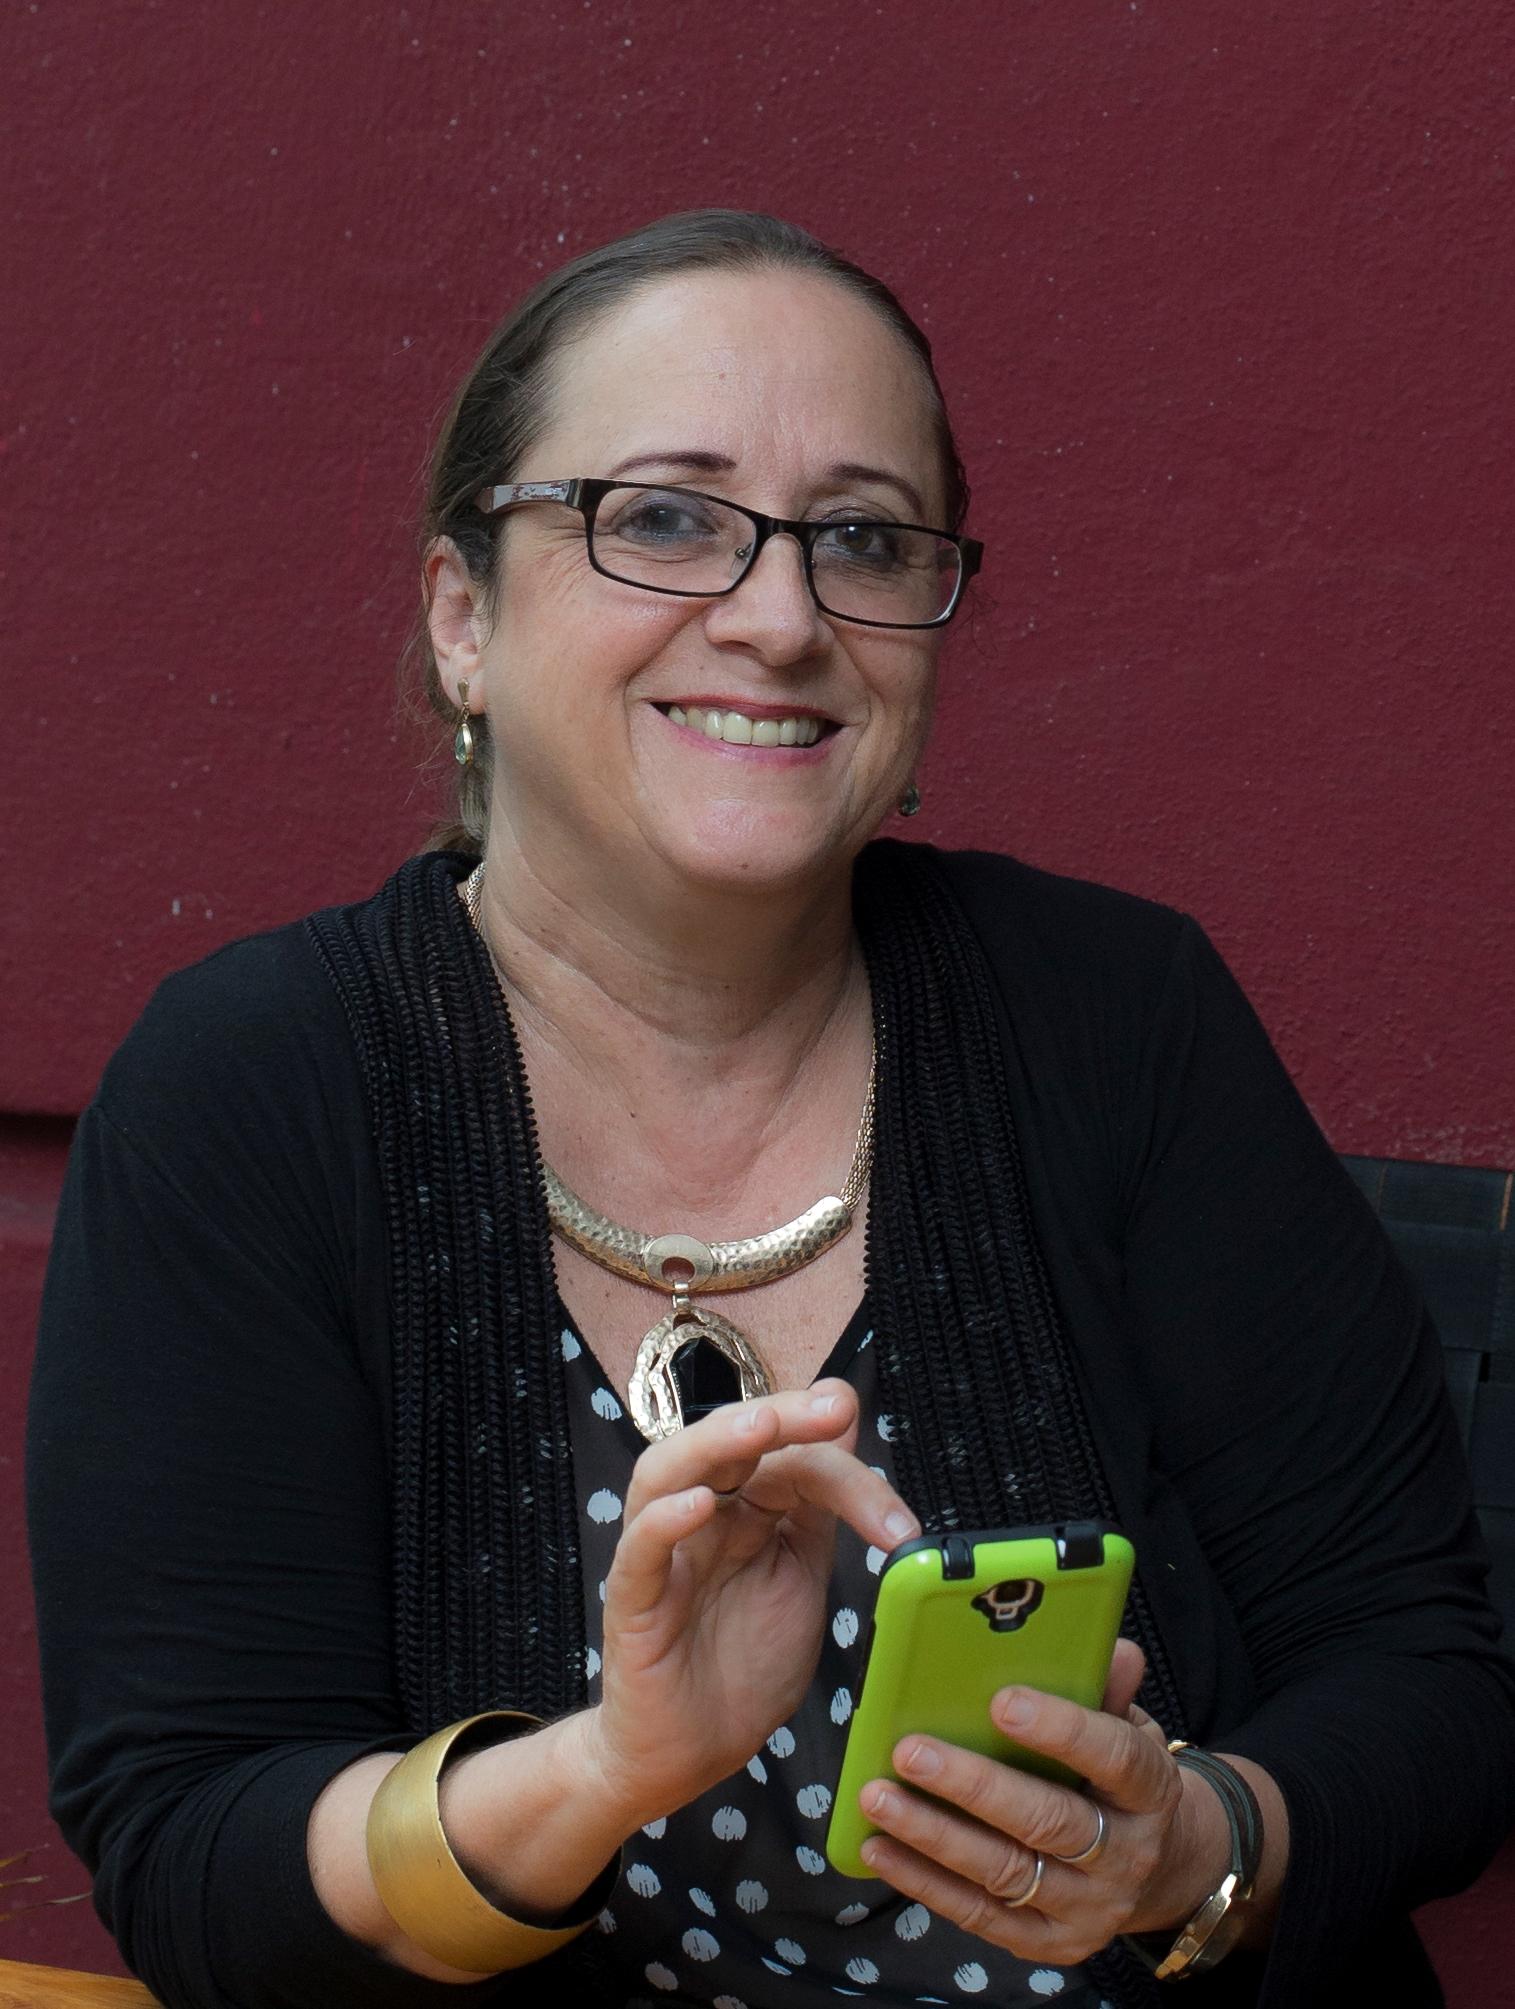 Gabriela Selser